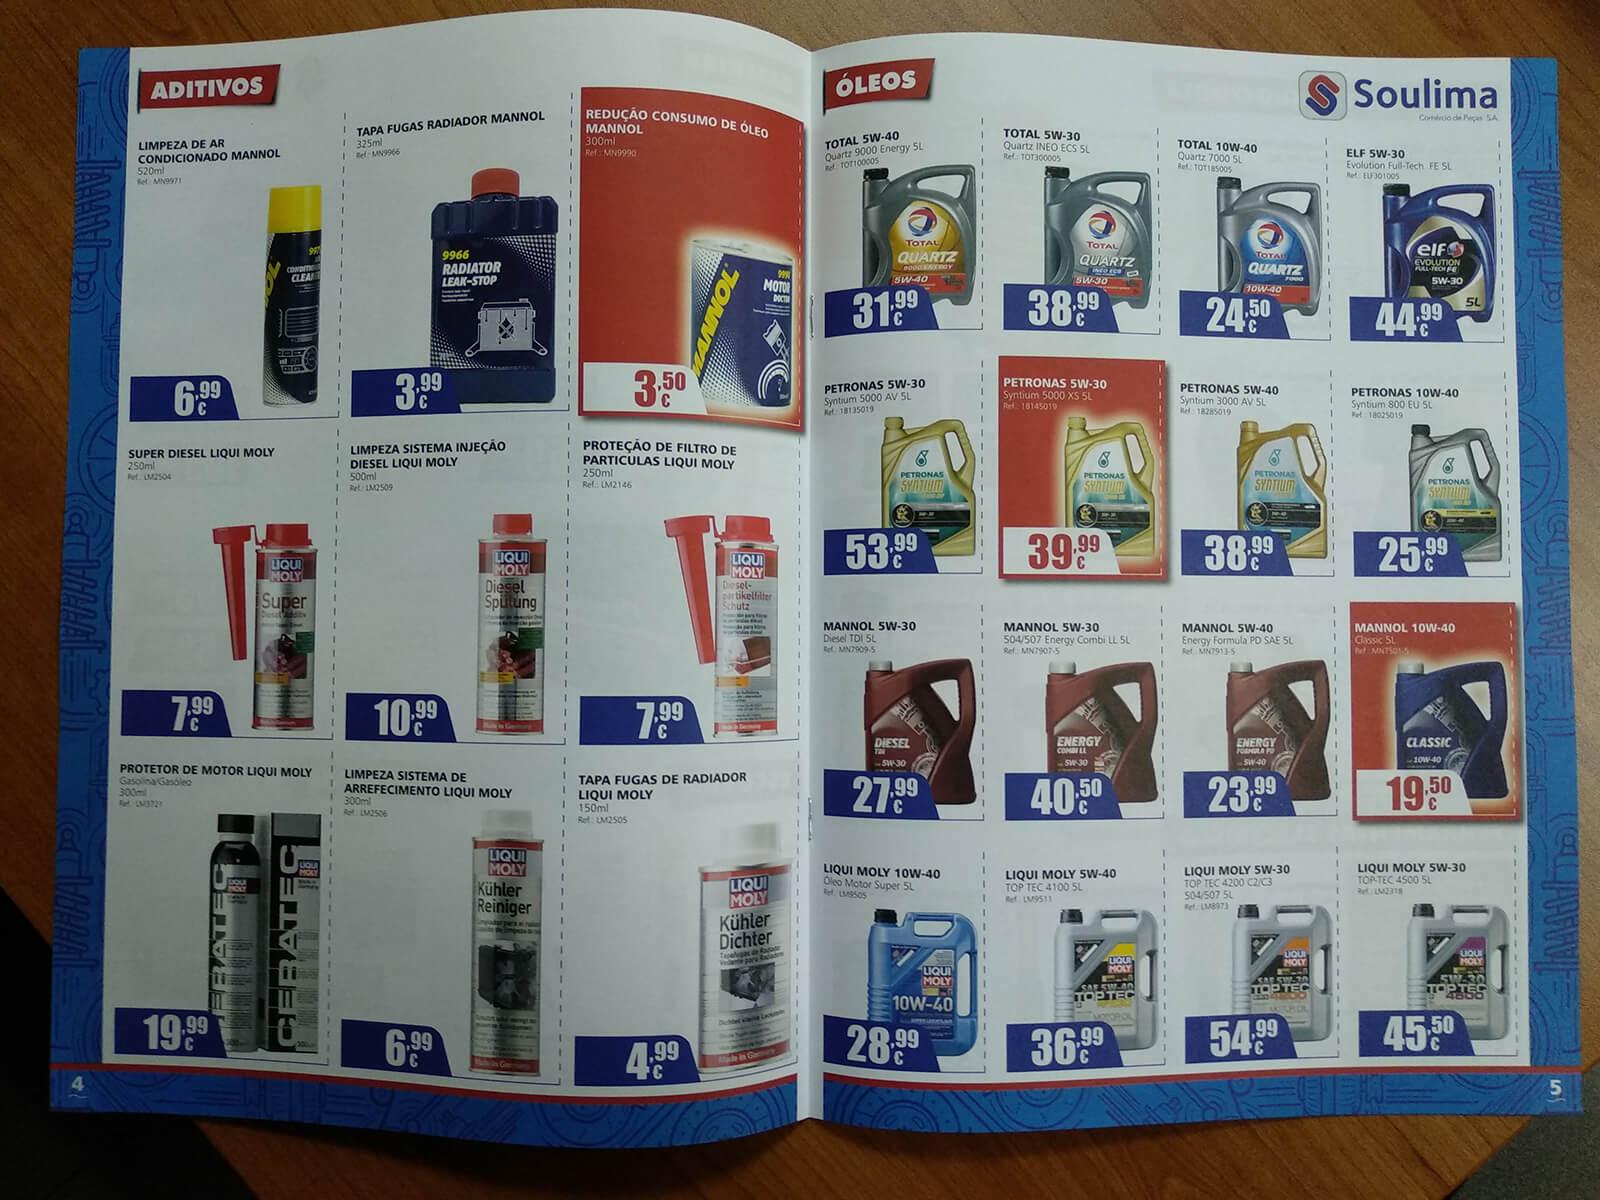 Soulima - Comércio de Peças - Printed Brochure Soulima - Interior | Luis Serra Freelancer